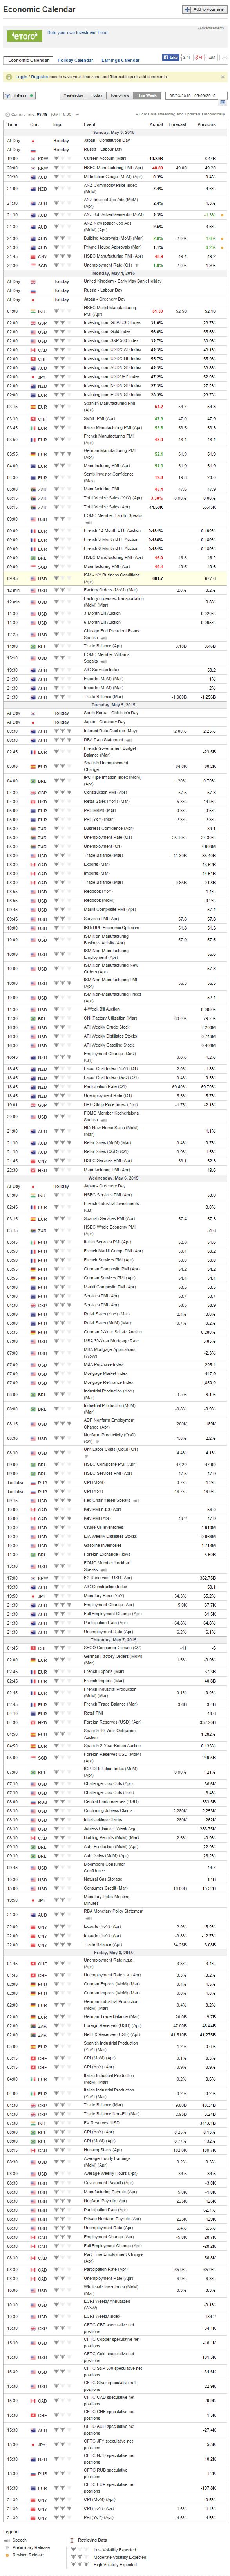 Economic Calendar  investing week of 5-4-2015